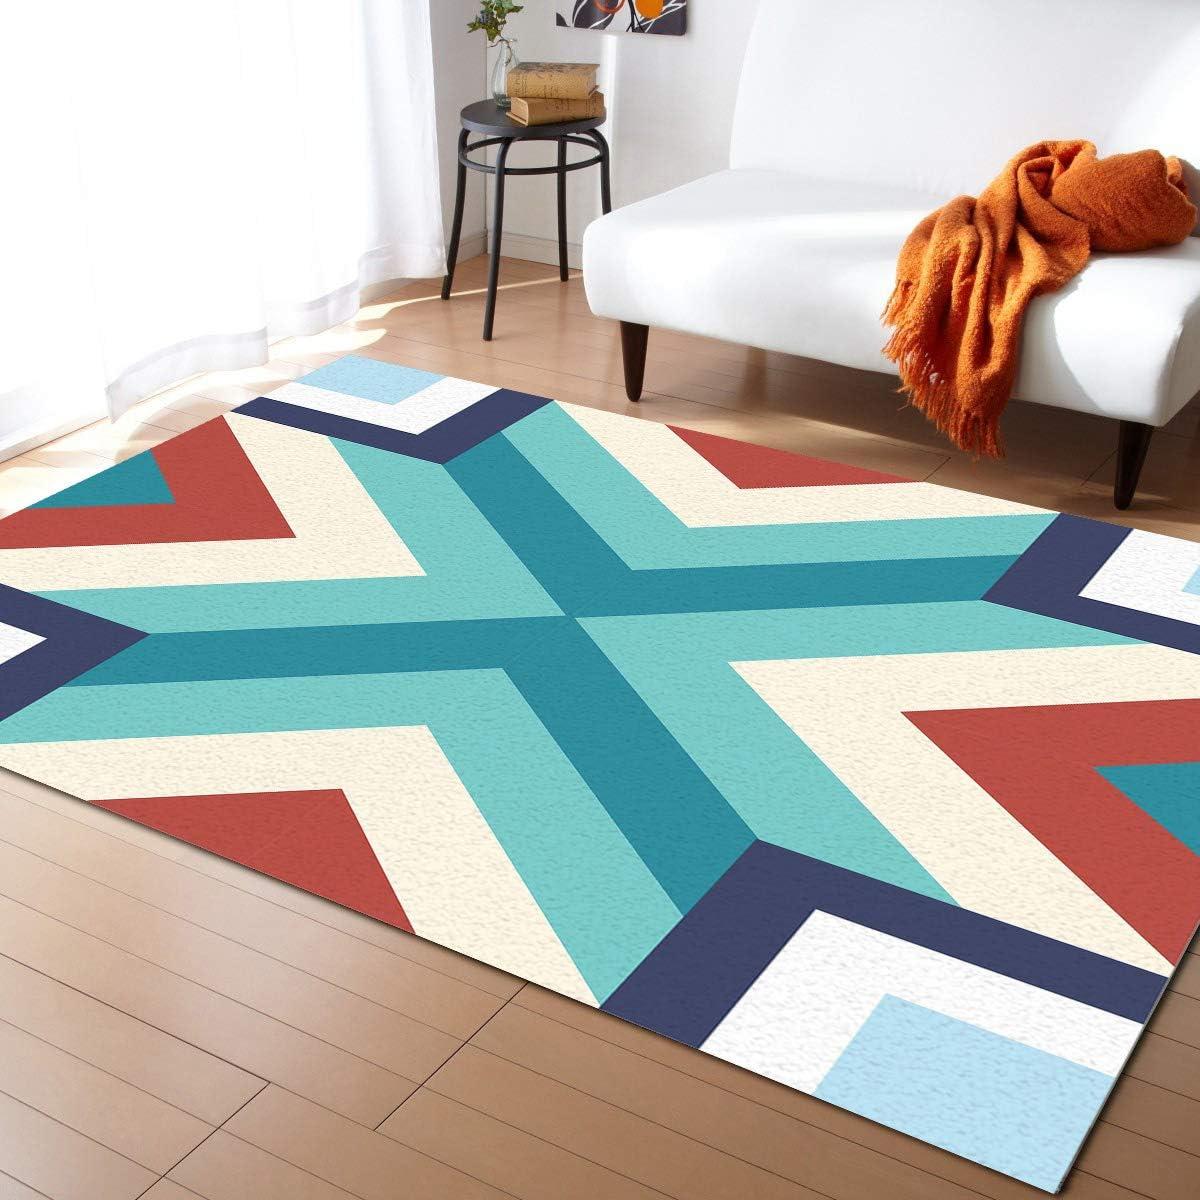 ARTSHOWING Vintage Decor Area Rug Non-Slip OFFer f Carpets Decorative half